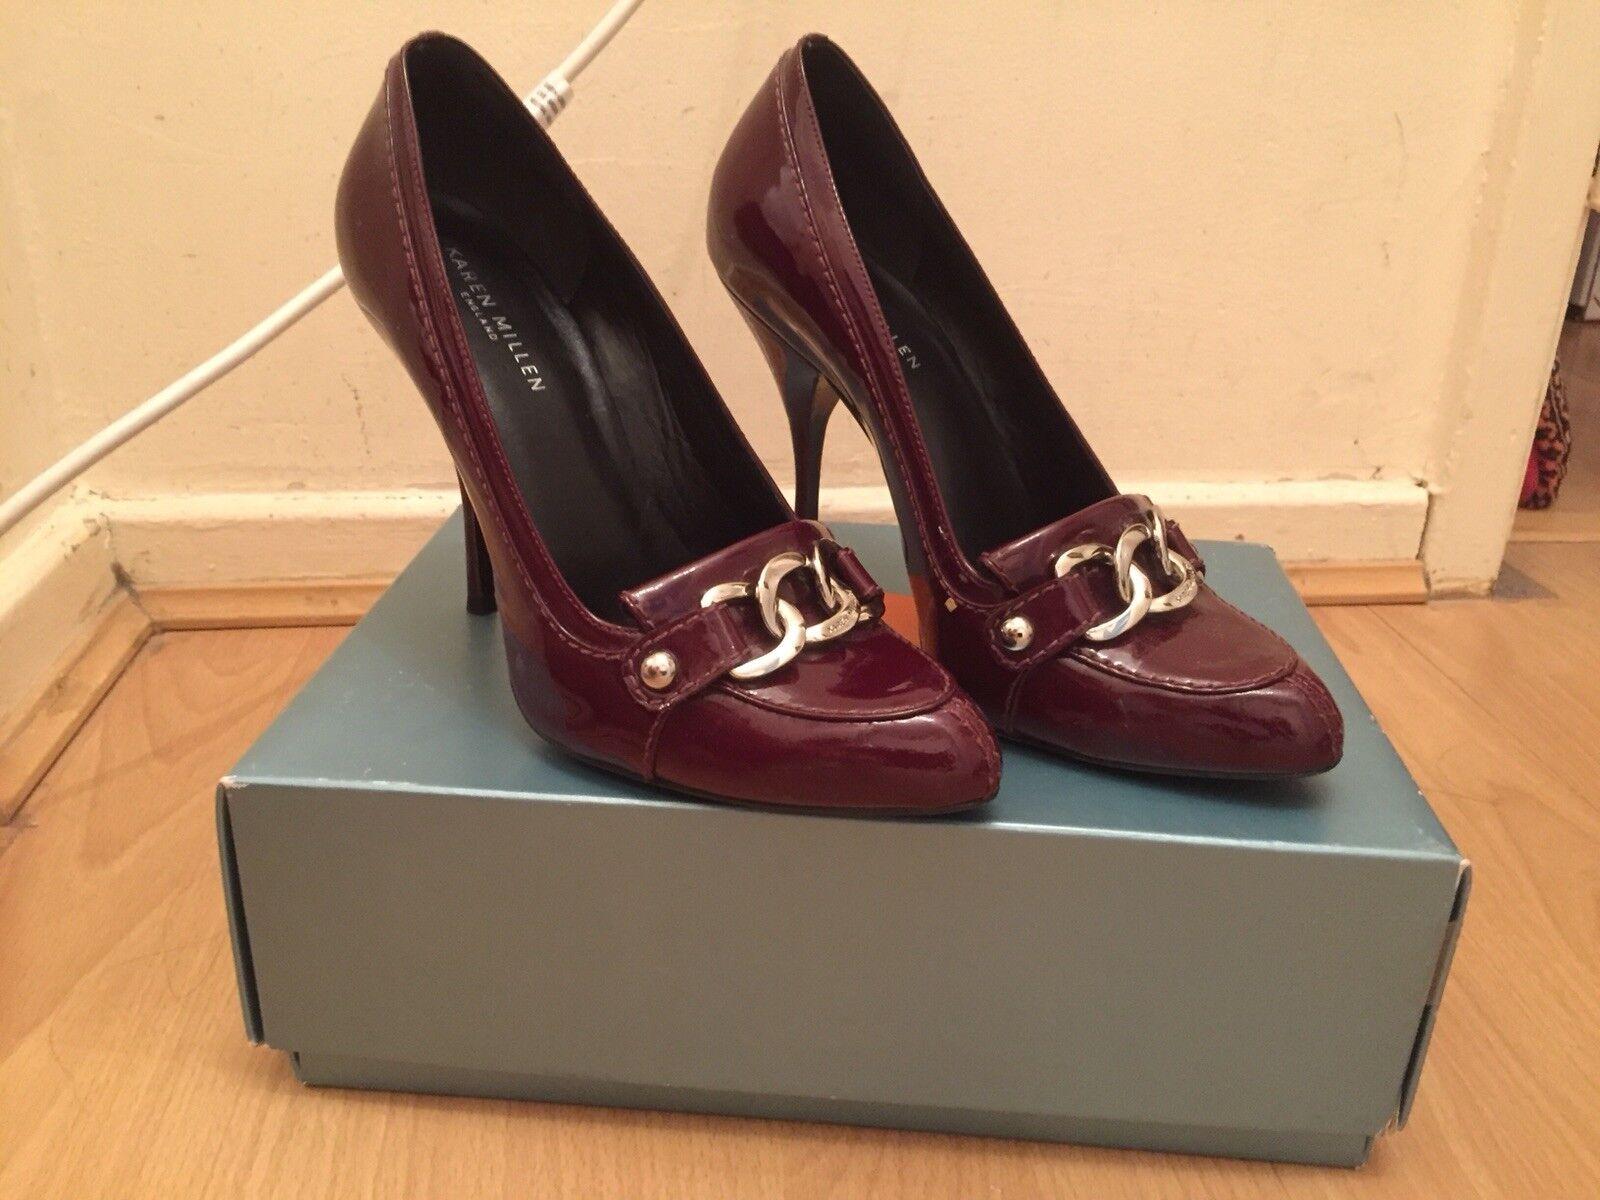 Karen Millen shoes - Immaculate